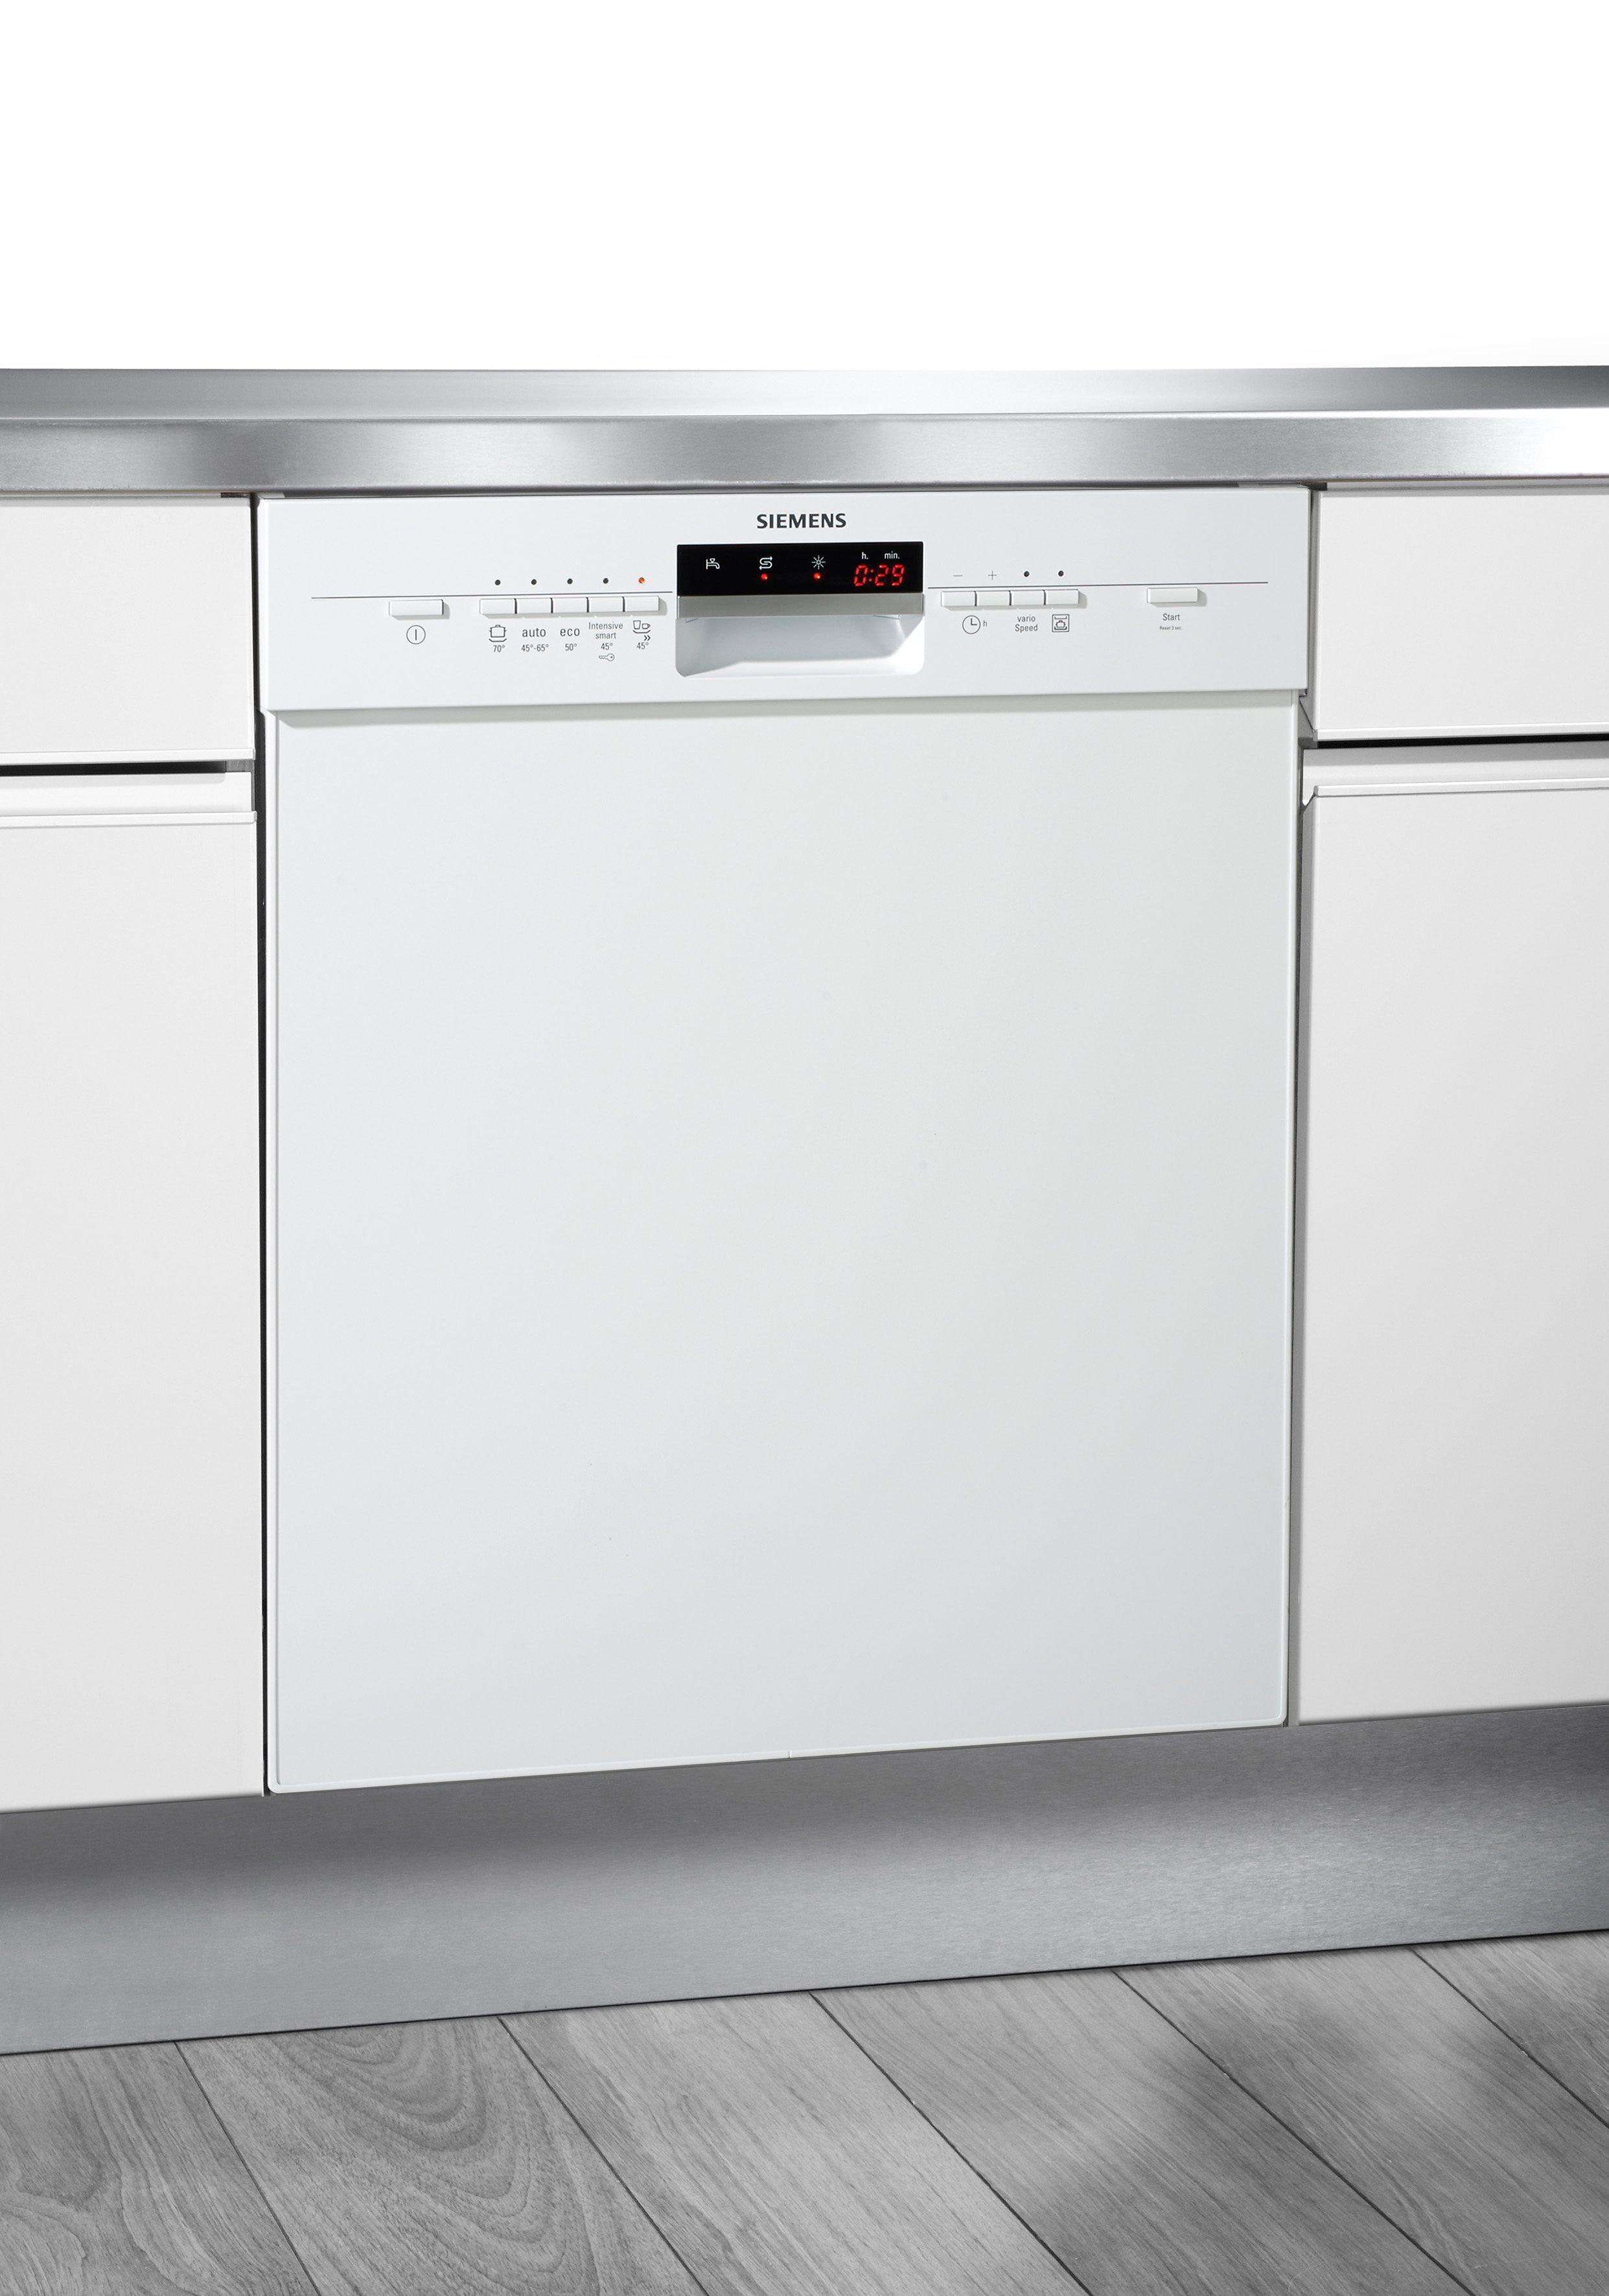 Siemens Unterbau-Geschirrspüler SN35L230EU, A++, 10 Liter, 12 Maßgedecke